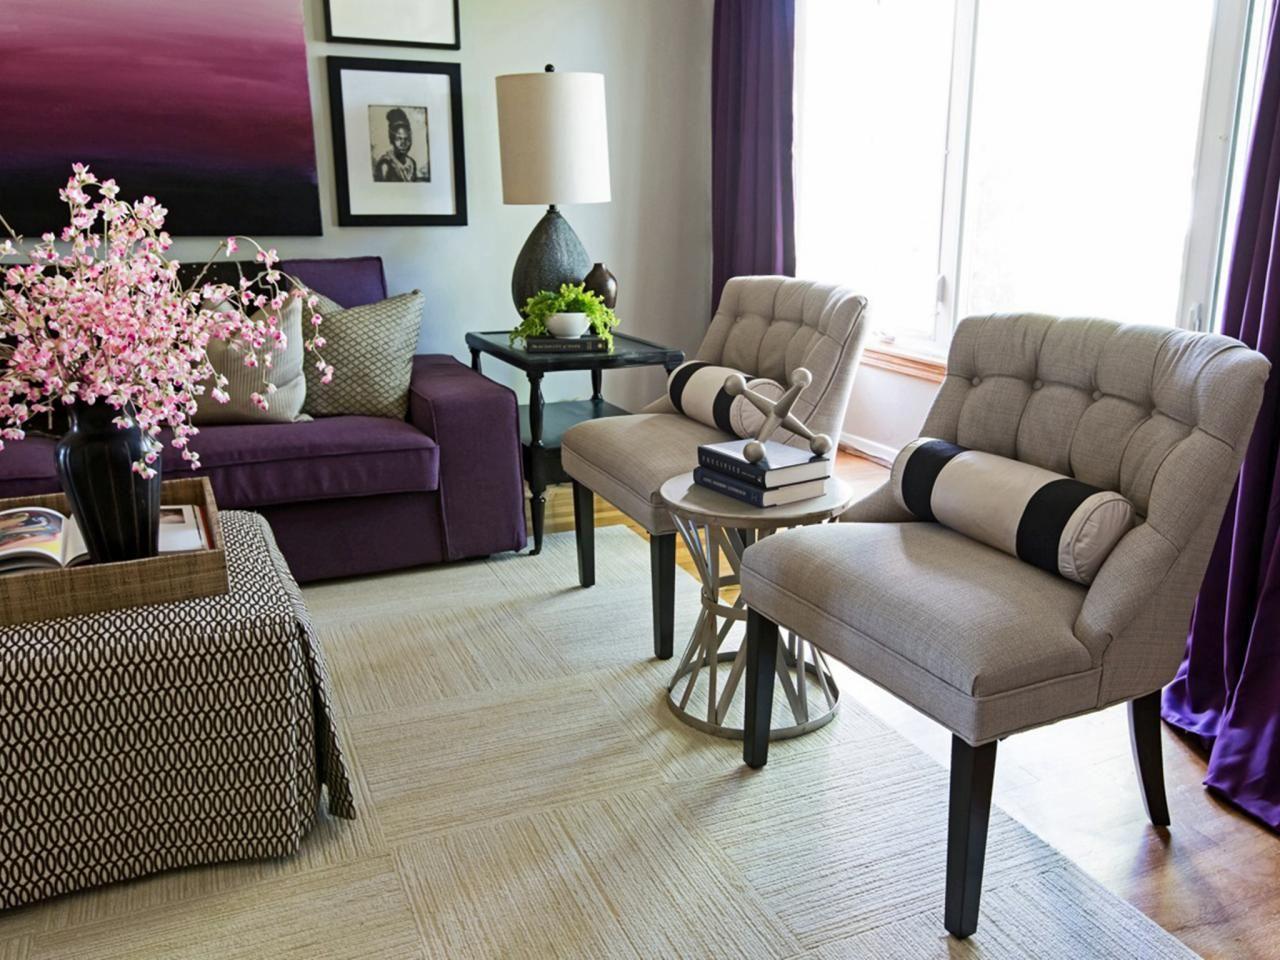 This Purple And Cream Living Room Features A Cream And Plum Color Palette That S Feminine Enough Diseno De Interiores Decoracion De Interiores Decoracion Hogar